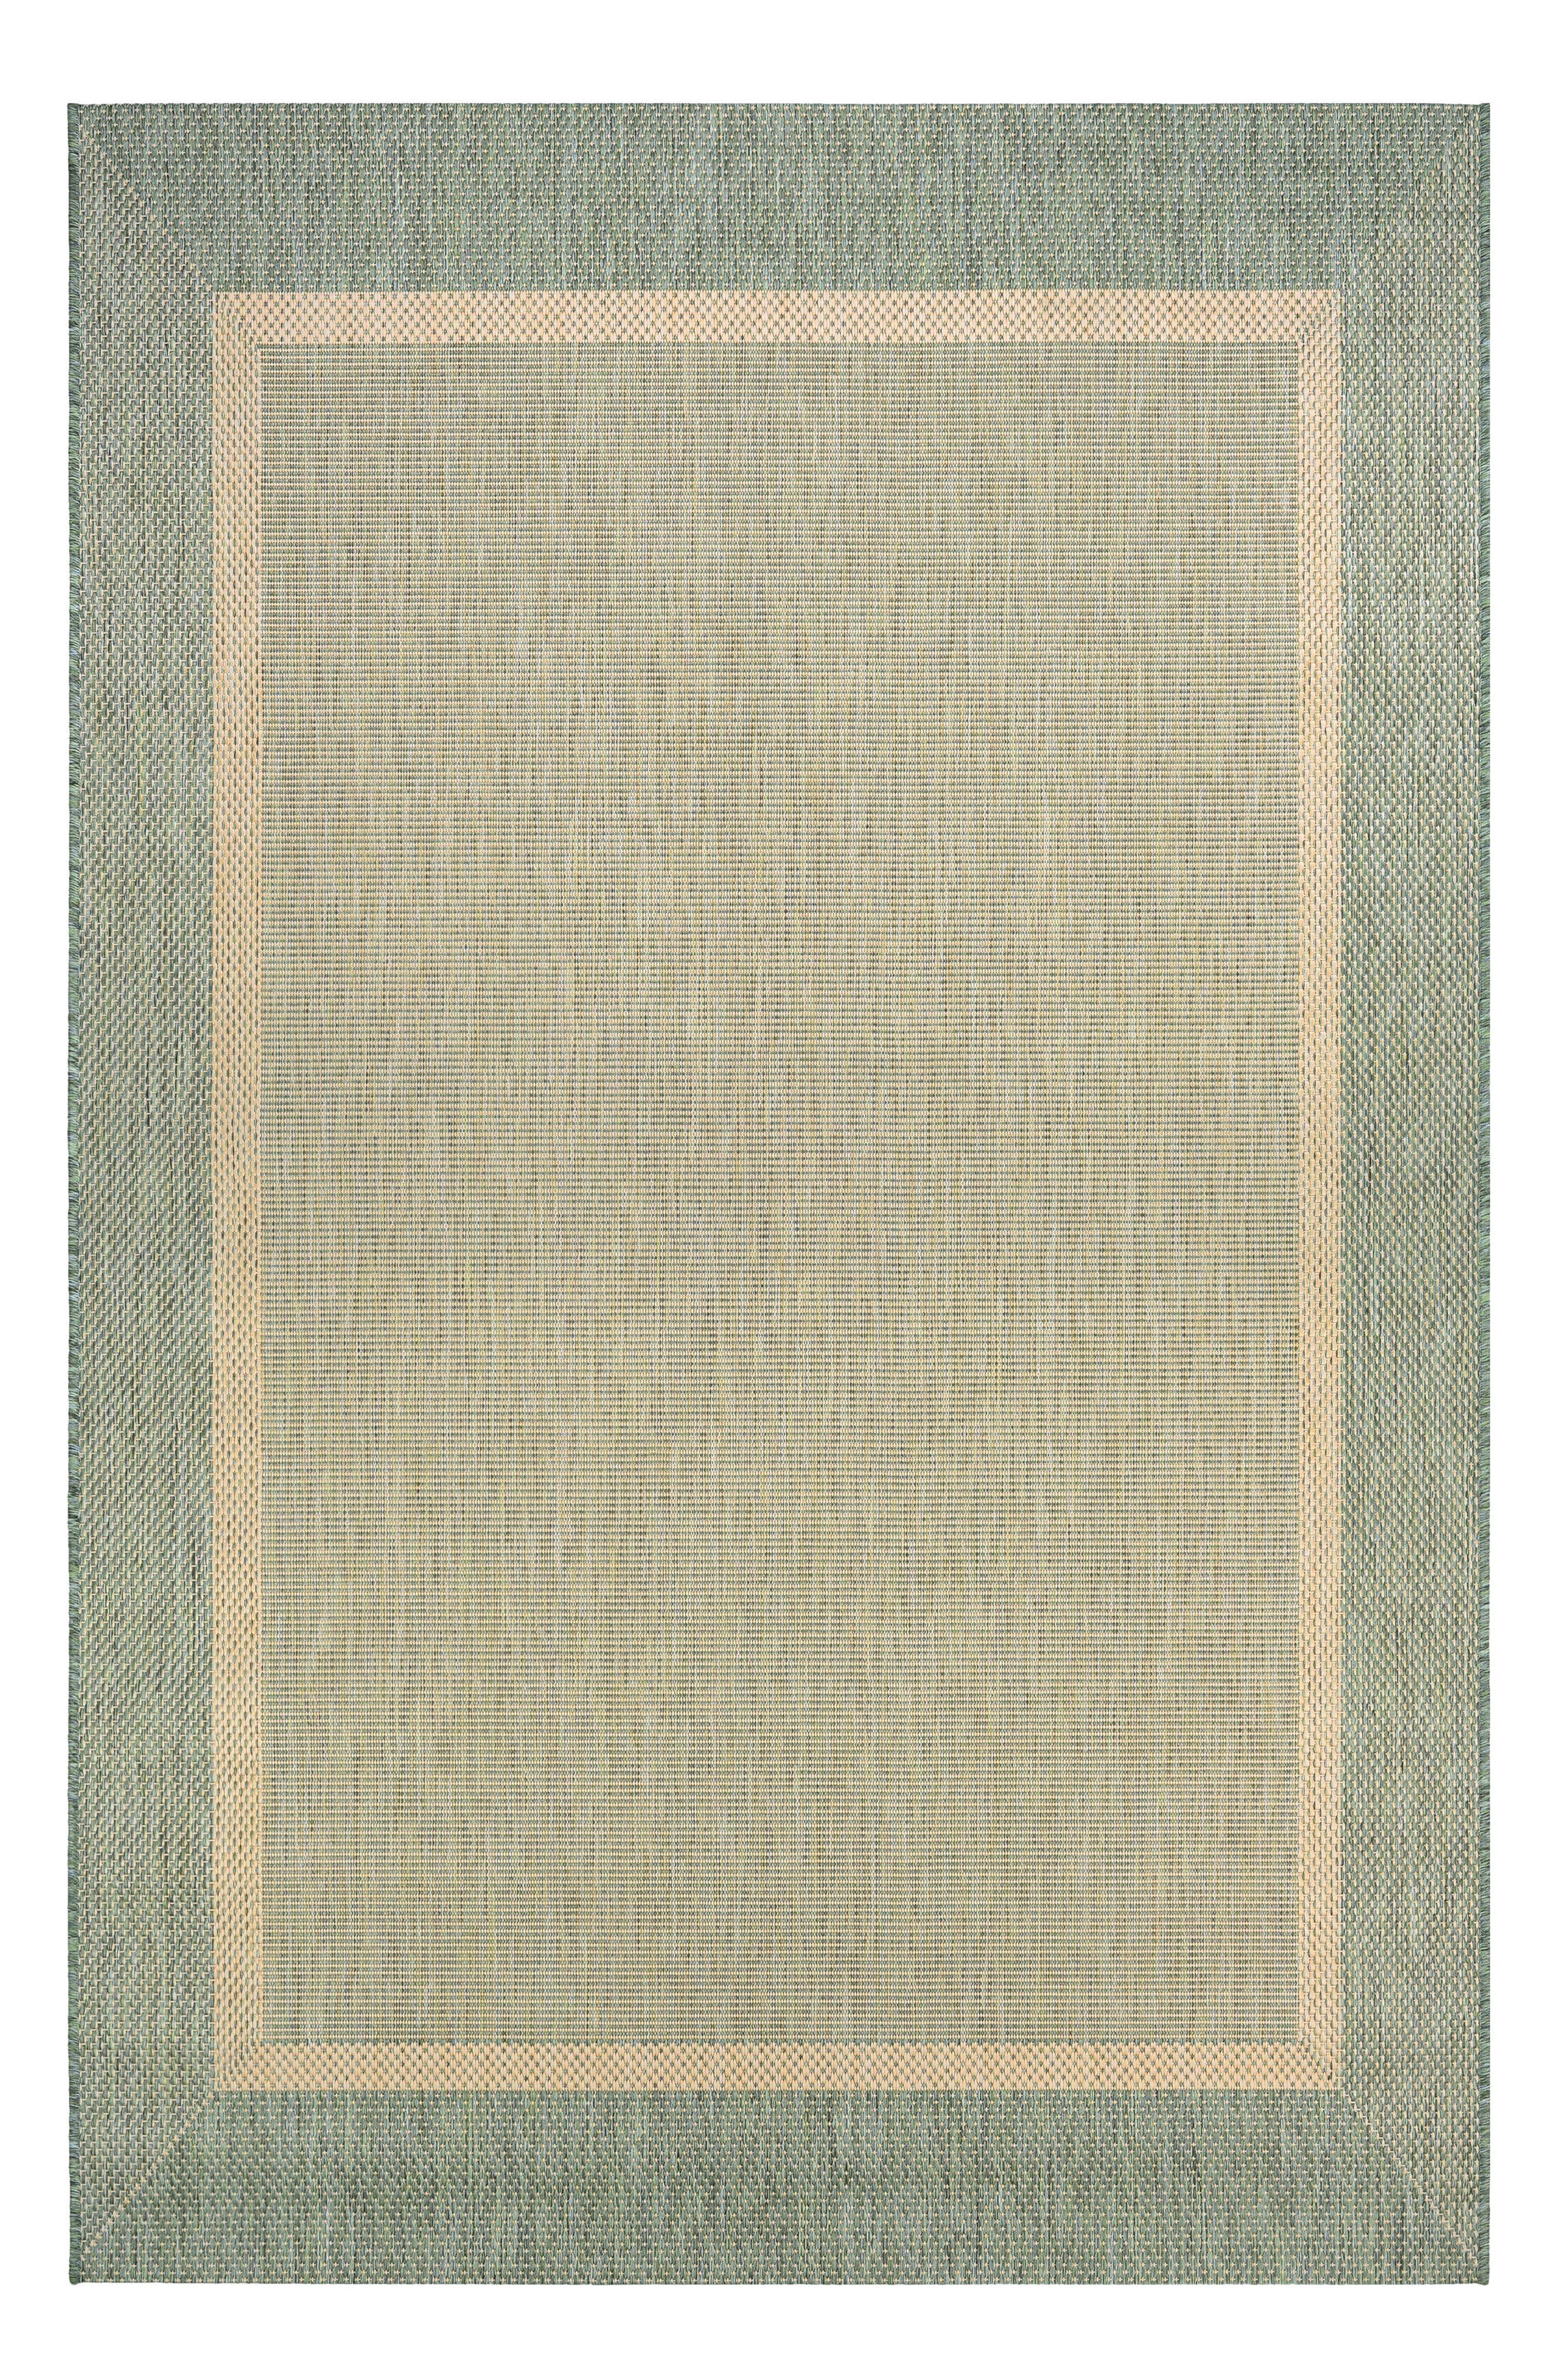 Stria Texture Indoor/Outdoor Rug,                         Main,                         color, Natural/ Green